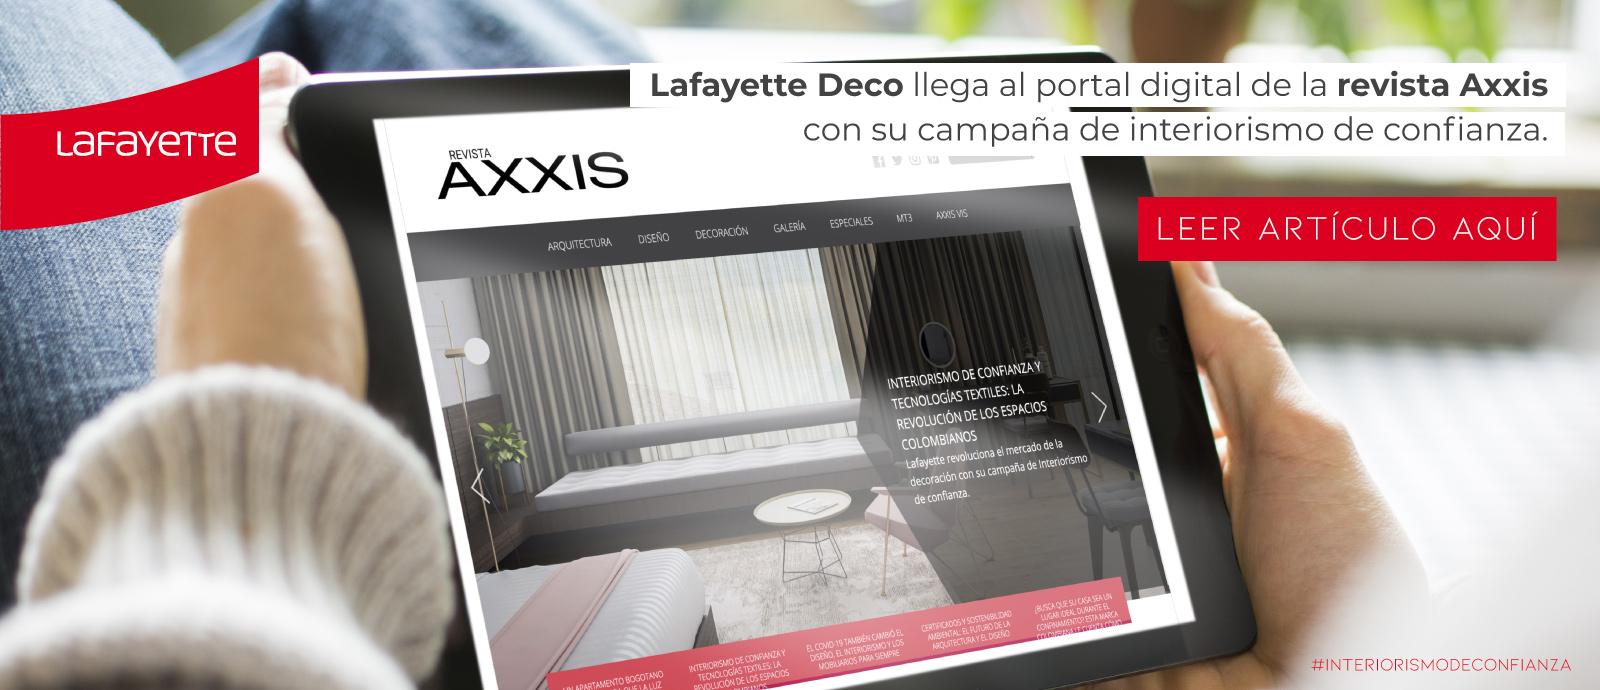 Axxis-Interiorismo-de-confianza